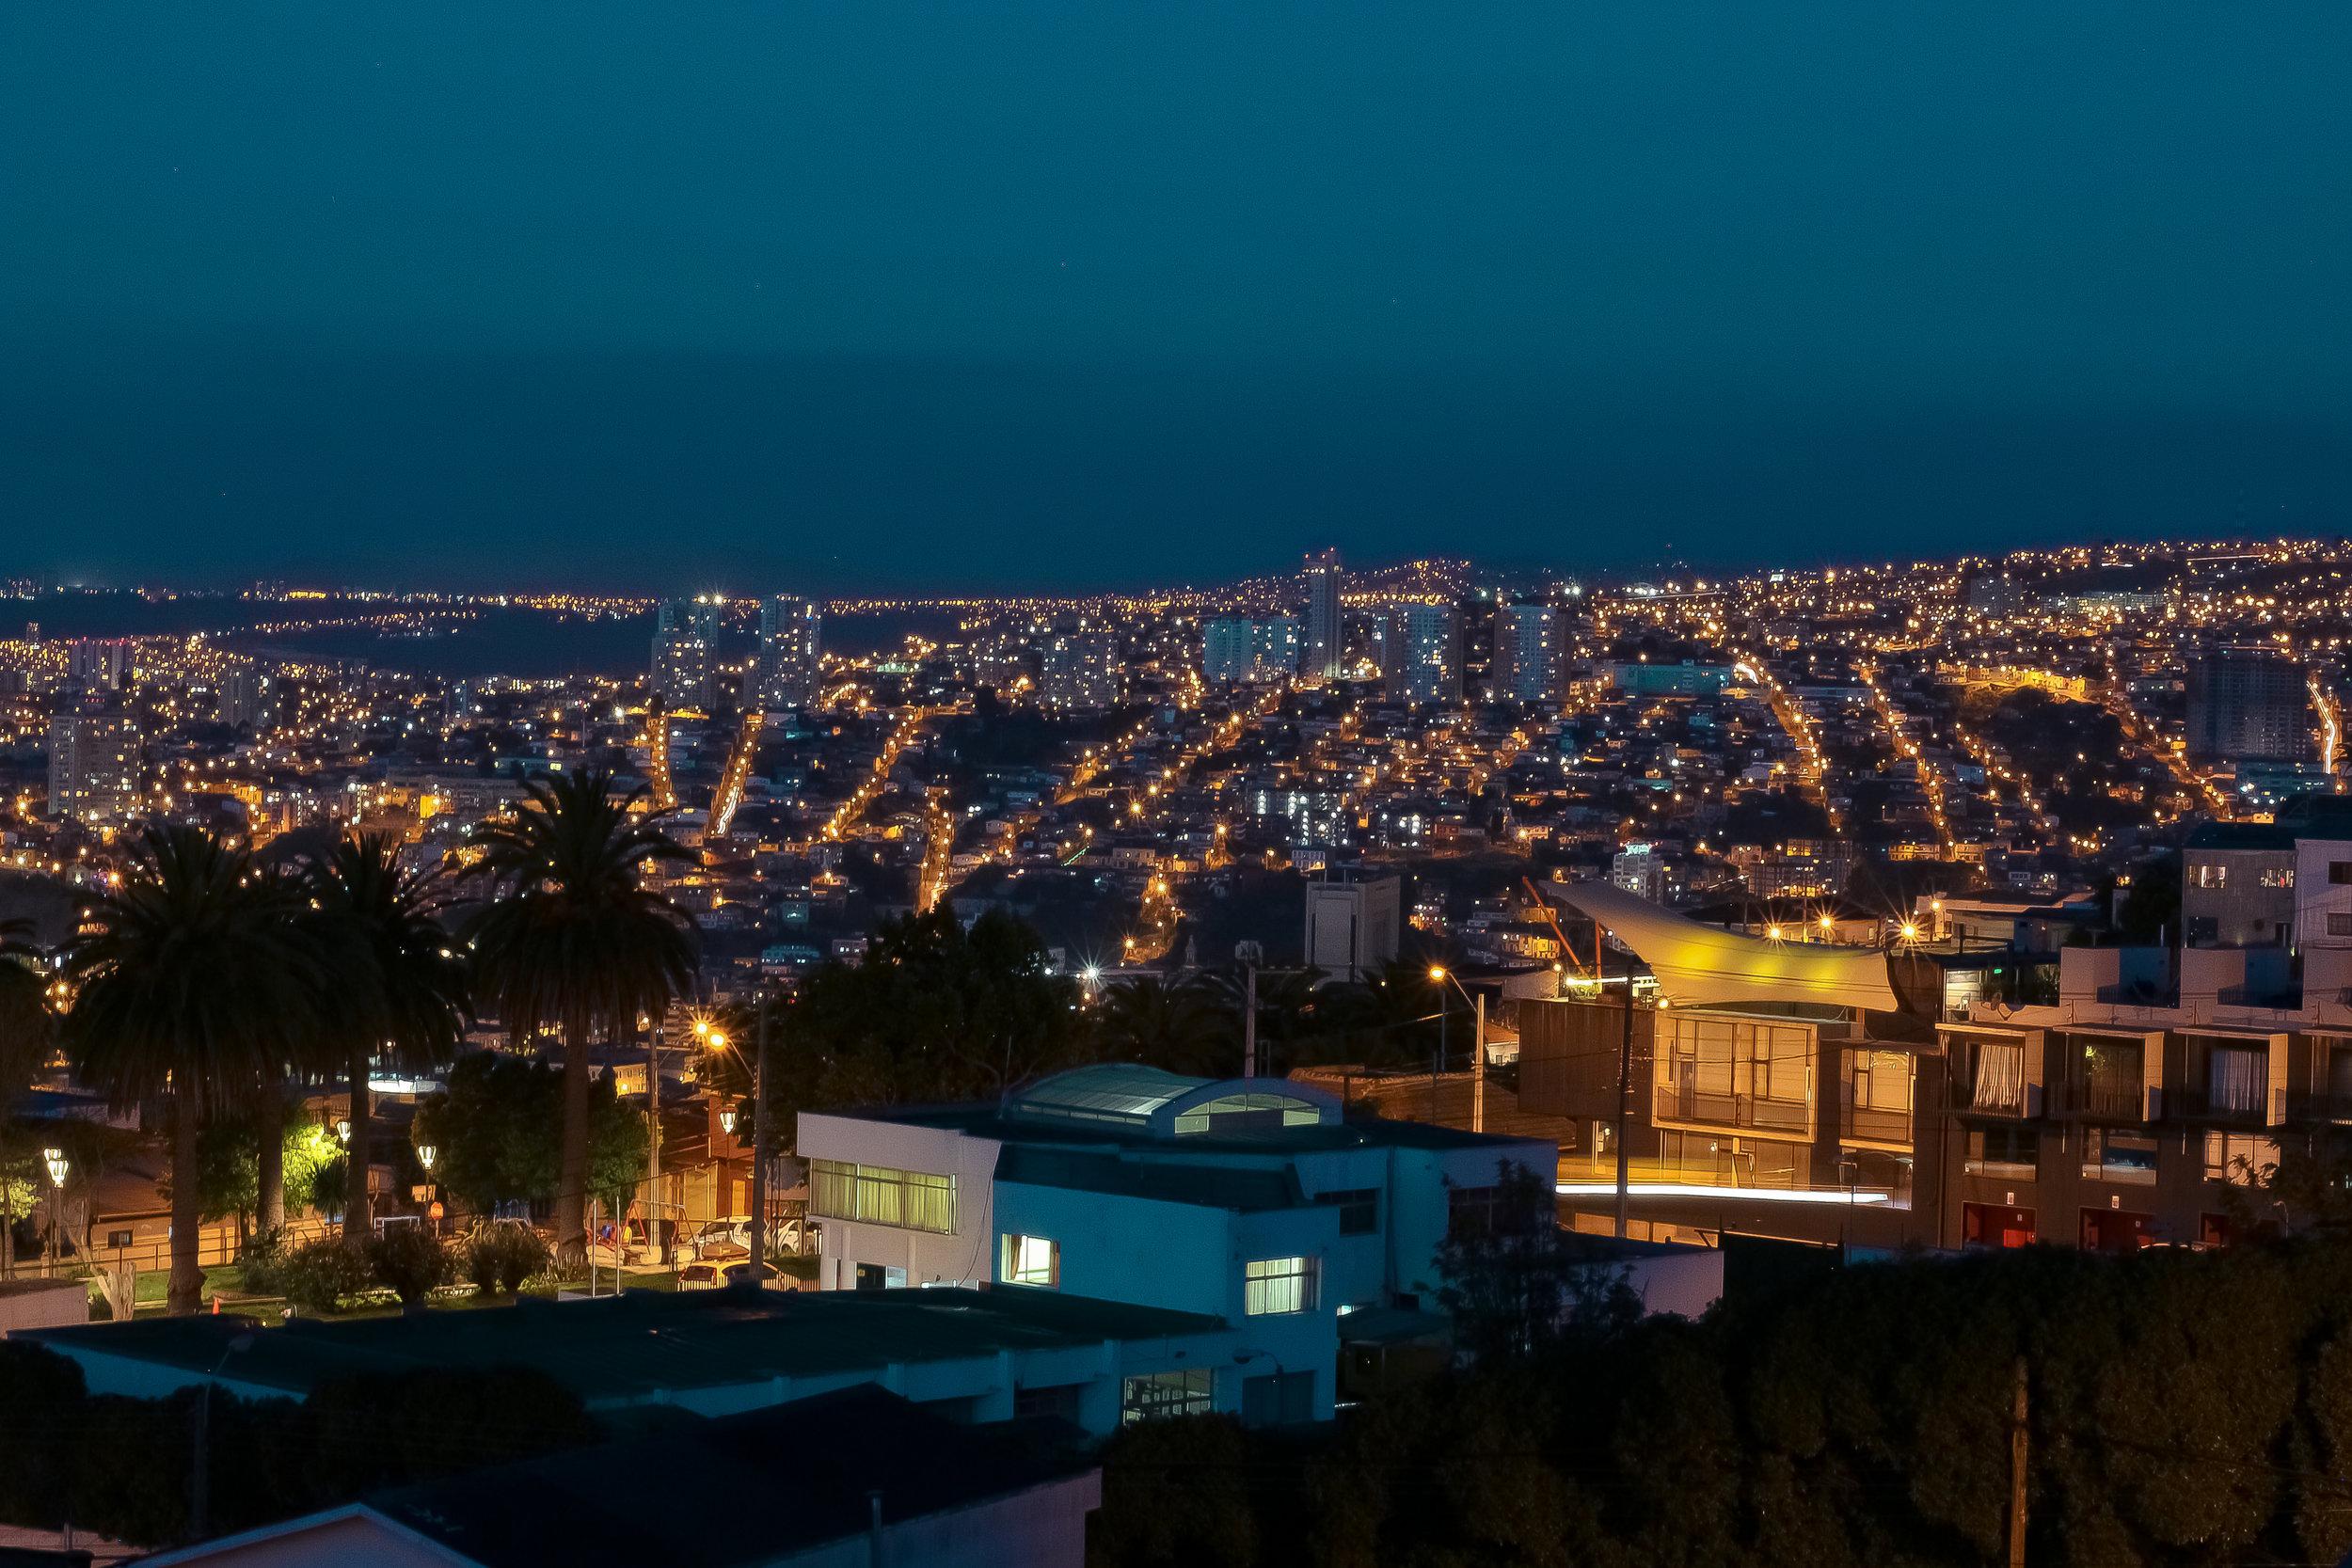 (2) Tour por Valparaíso © Oriev Alejandro en Flickr